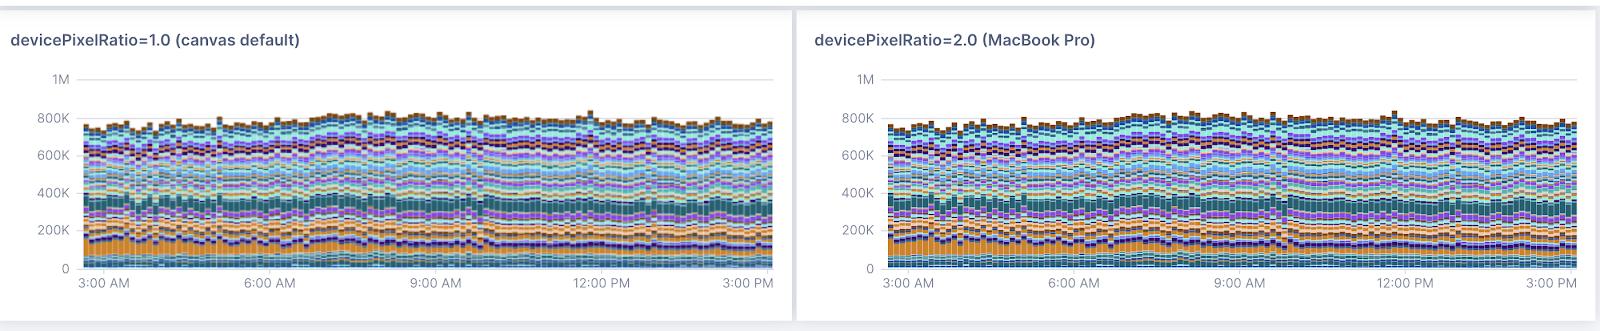 Lightstep Metrics Charting - devicePixelRatio 3